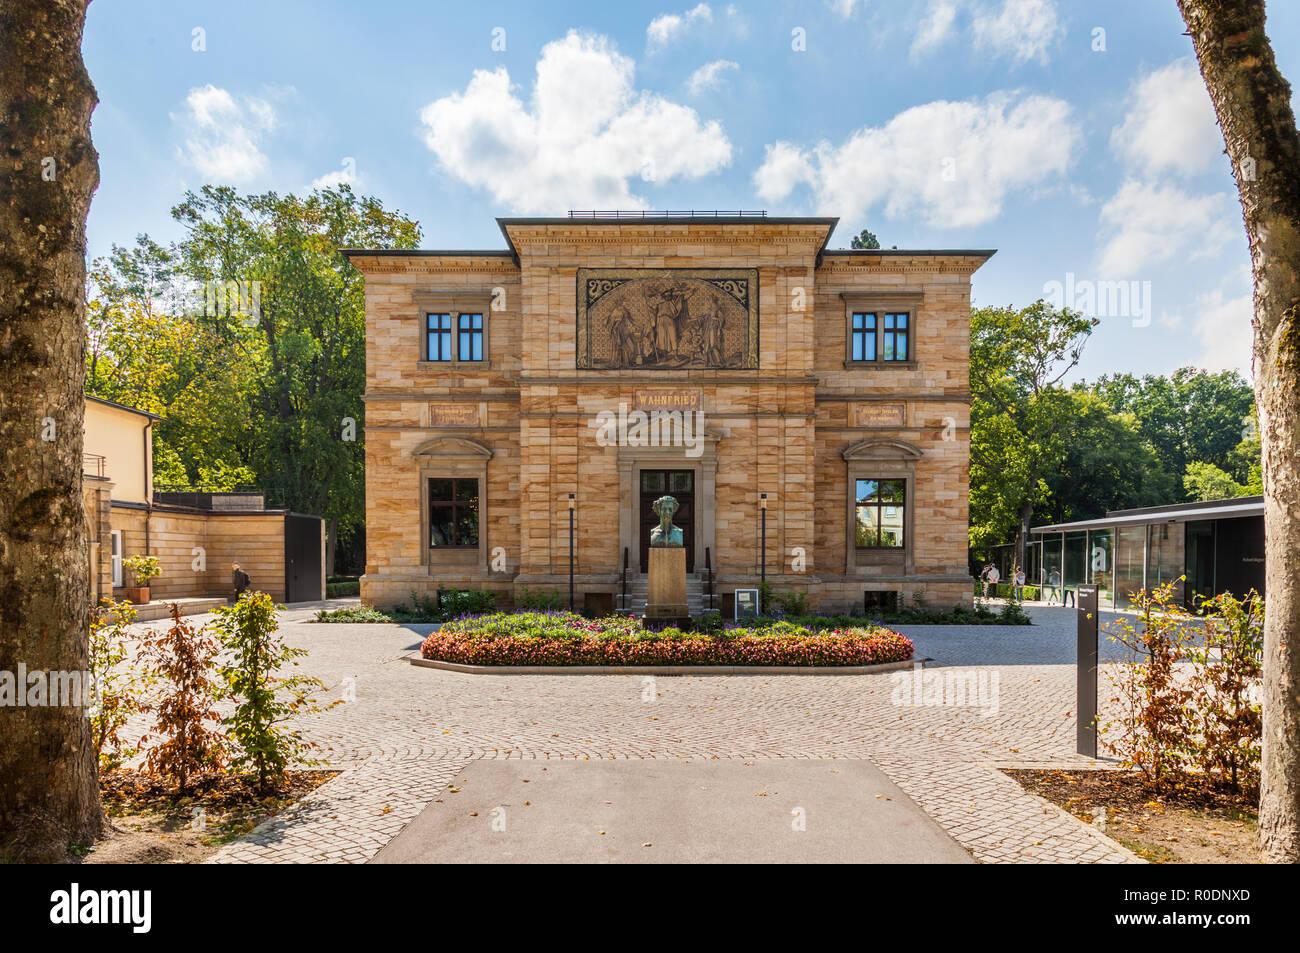 Villa Wahnfried, Bayreuth, Germany - Stock Image